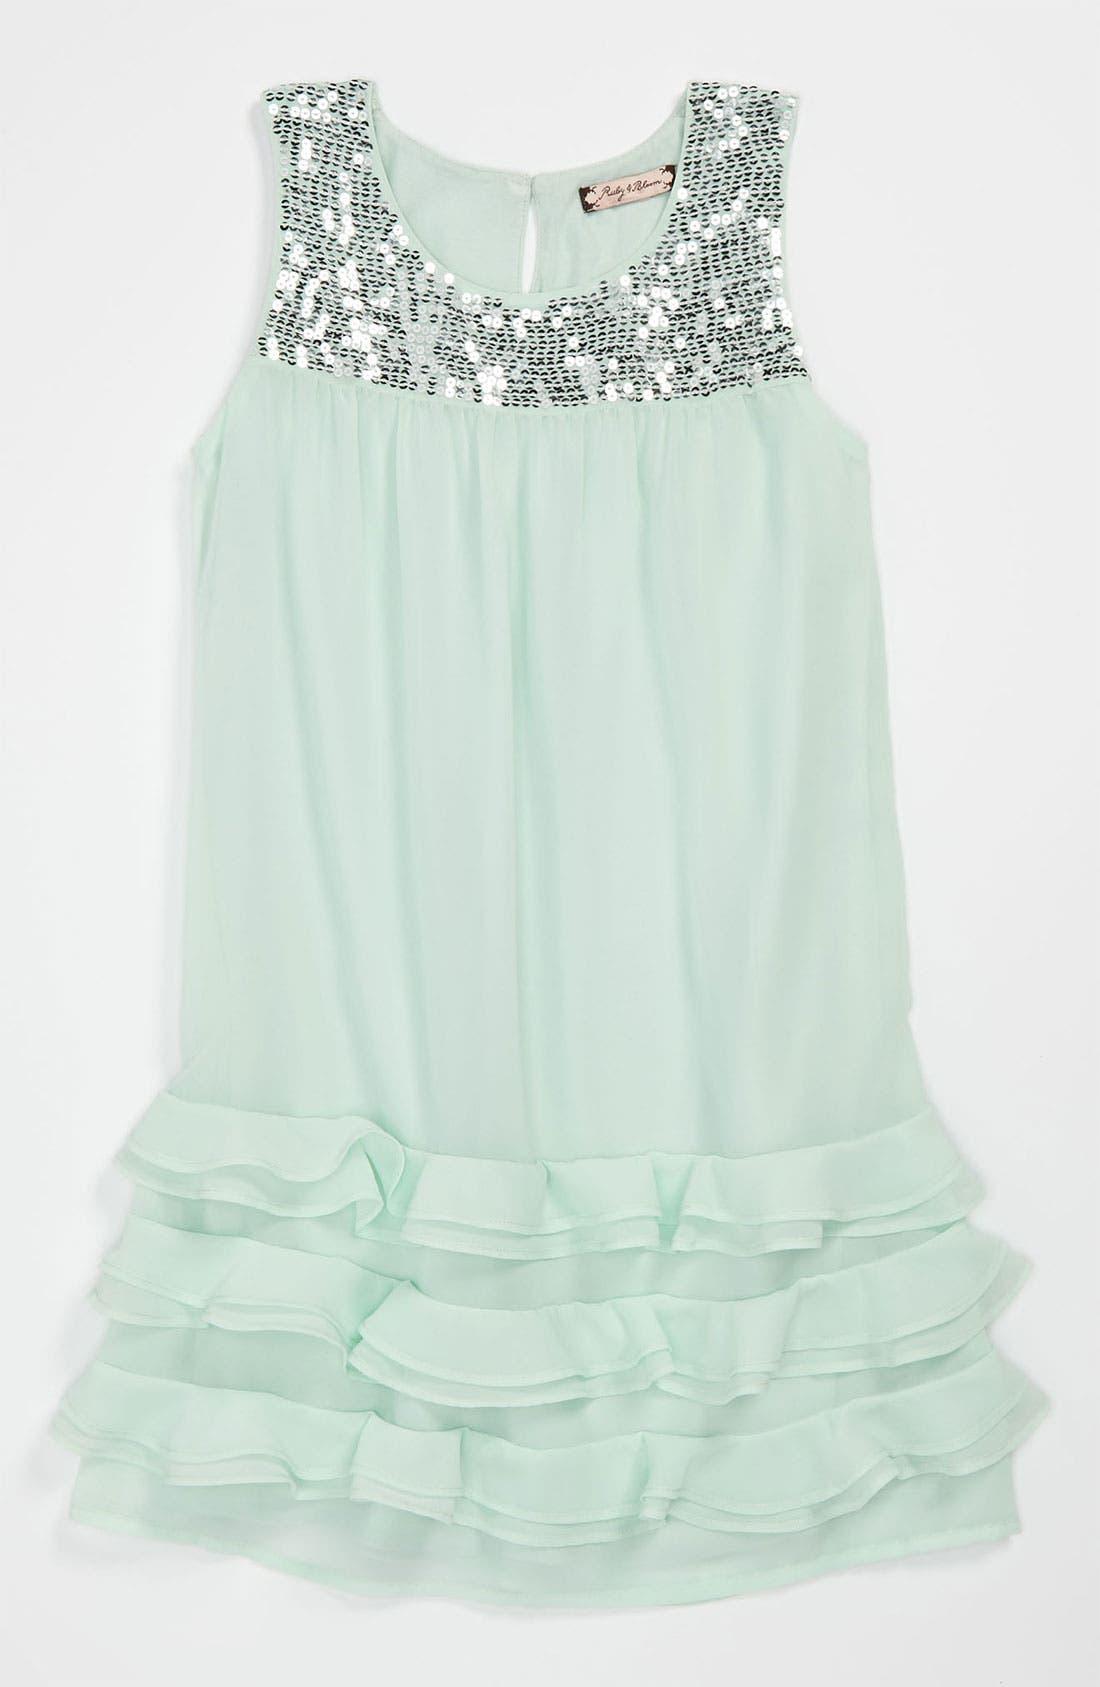 Main Image - Ruby & Bloom 'Sabrina' Dress (Little Girls & Big Girls)